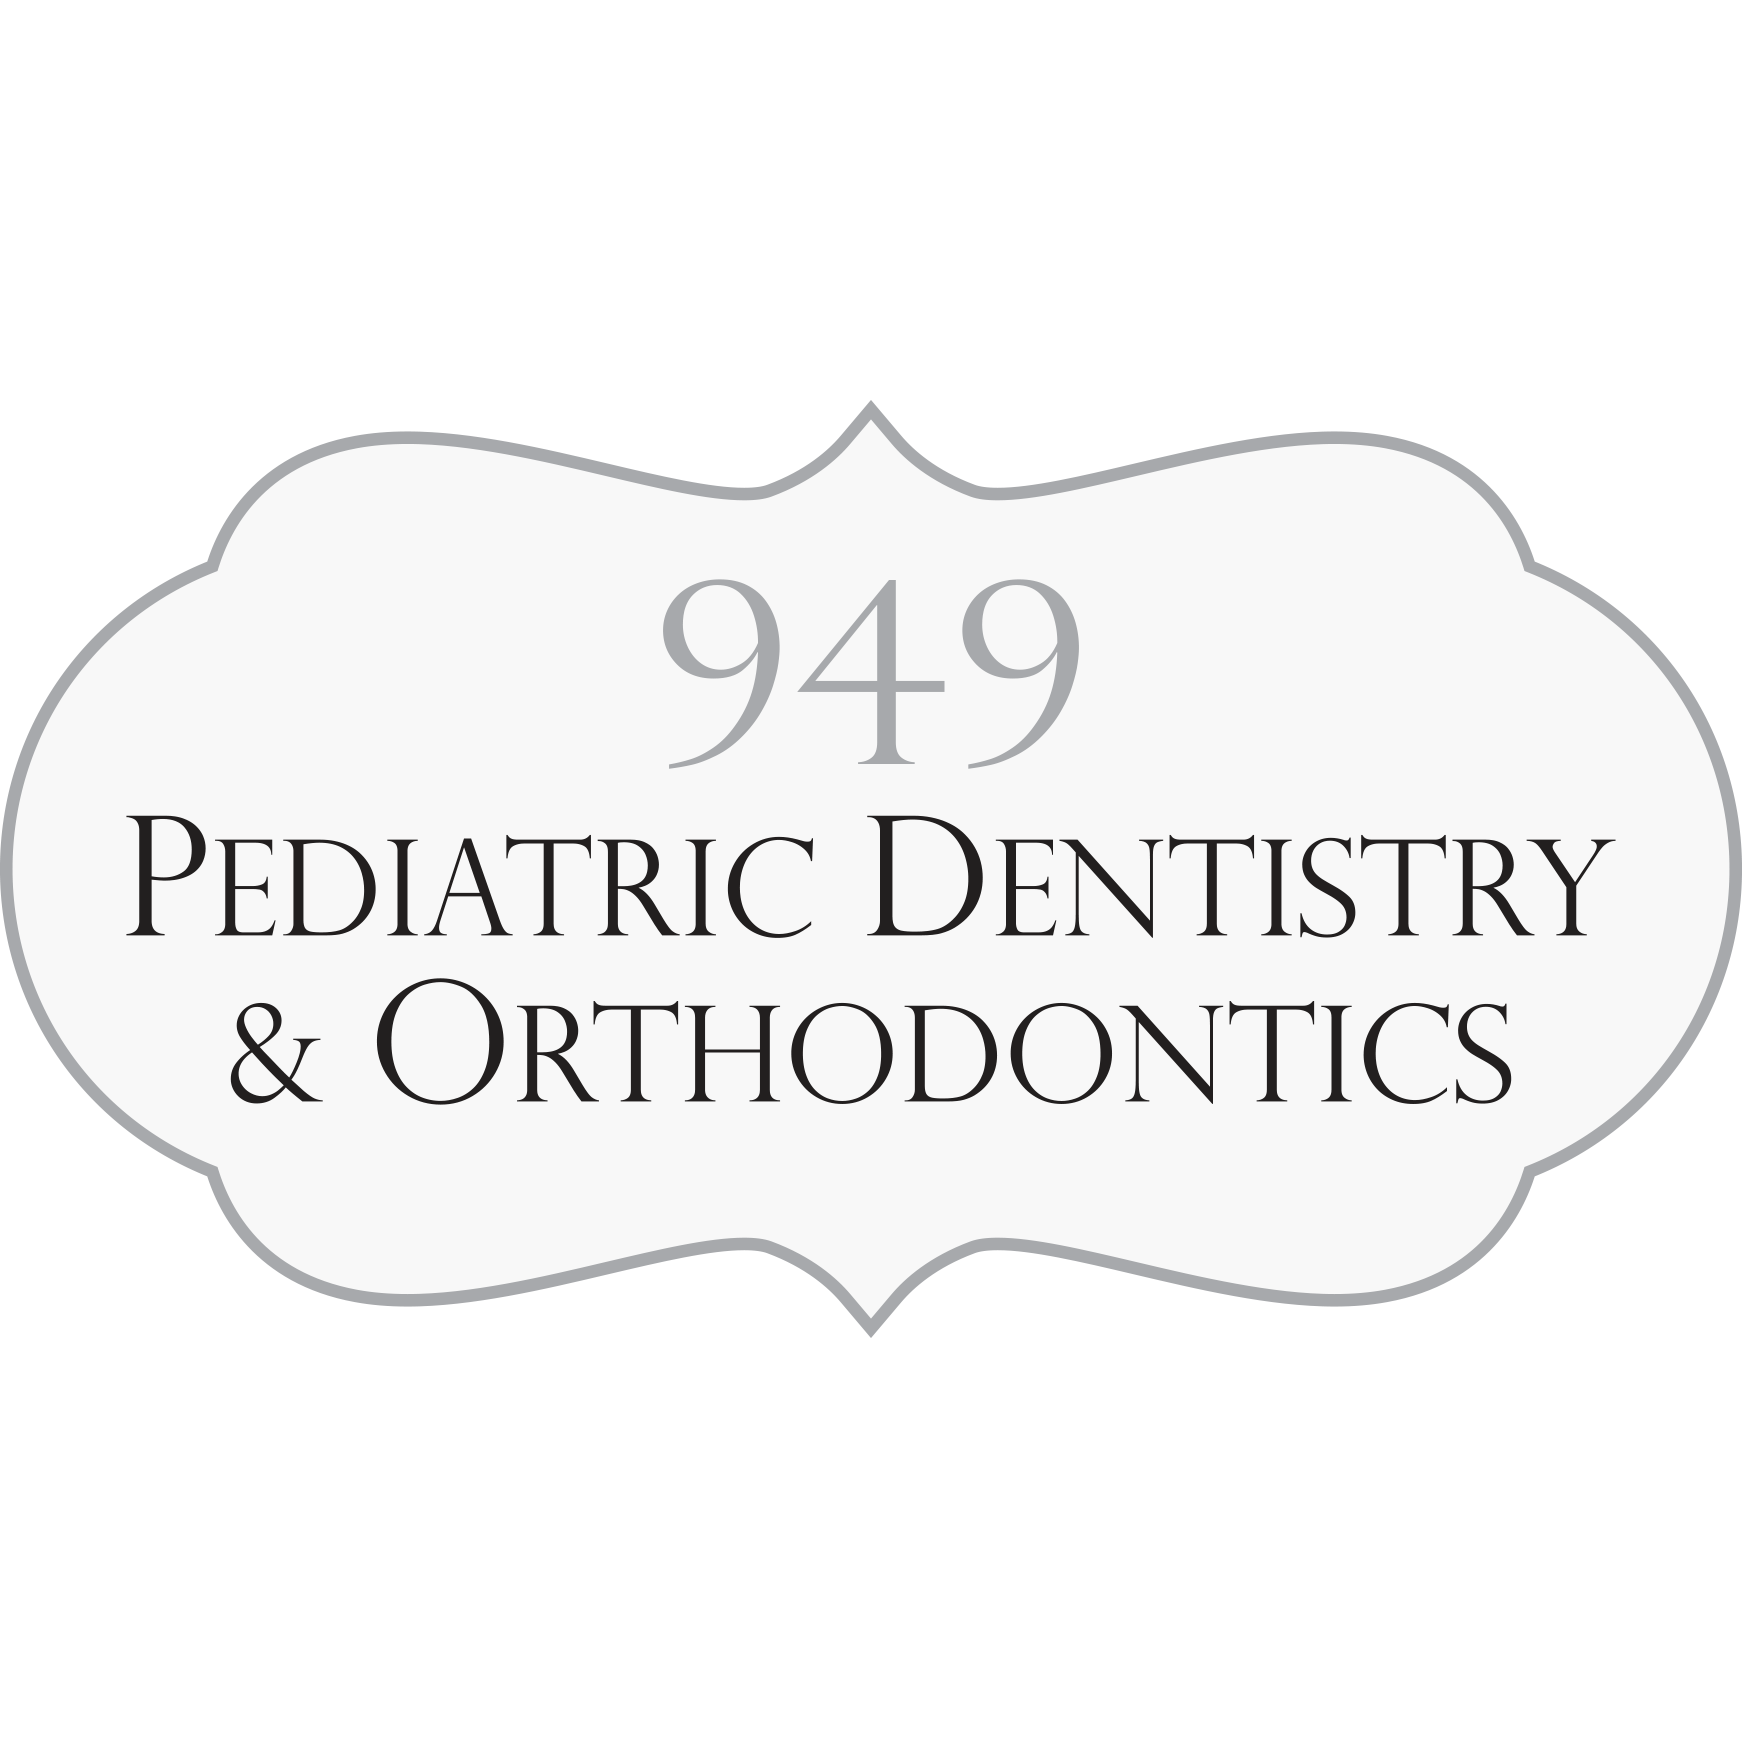 949 Pediatric Dentistry and Orthodontics